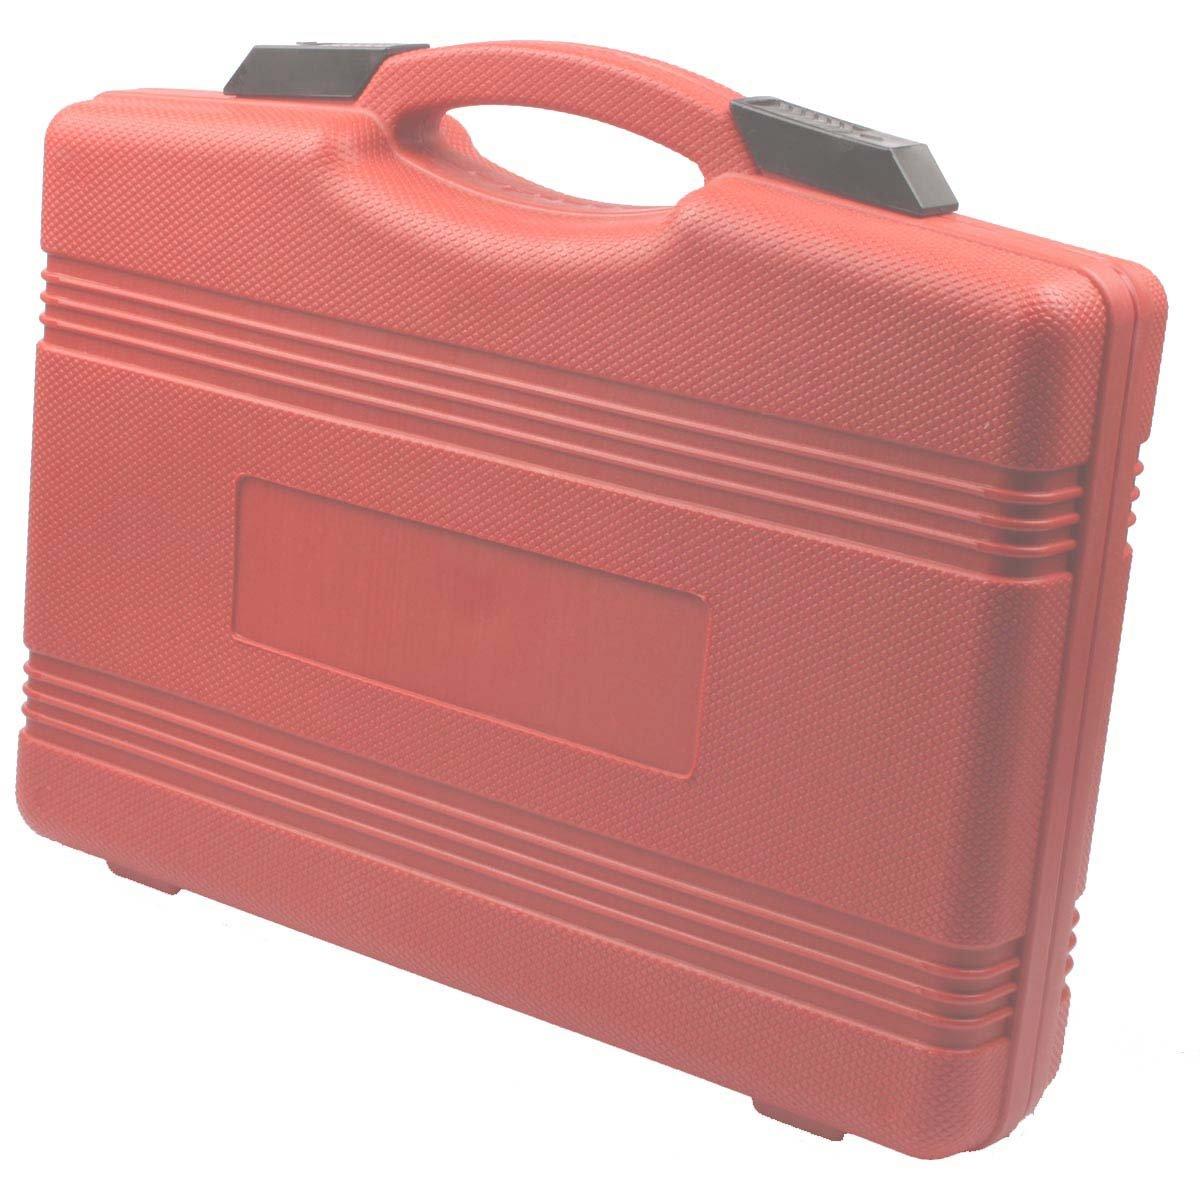 Pack of 2 M18 for Select Dodge//Subaru Models 2 Pack Fits 11//16 Dorman 097-830CD Copper Drain Plug Gasket